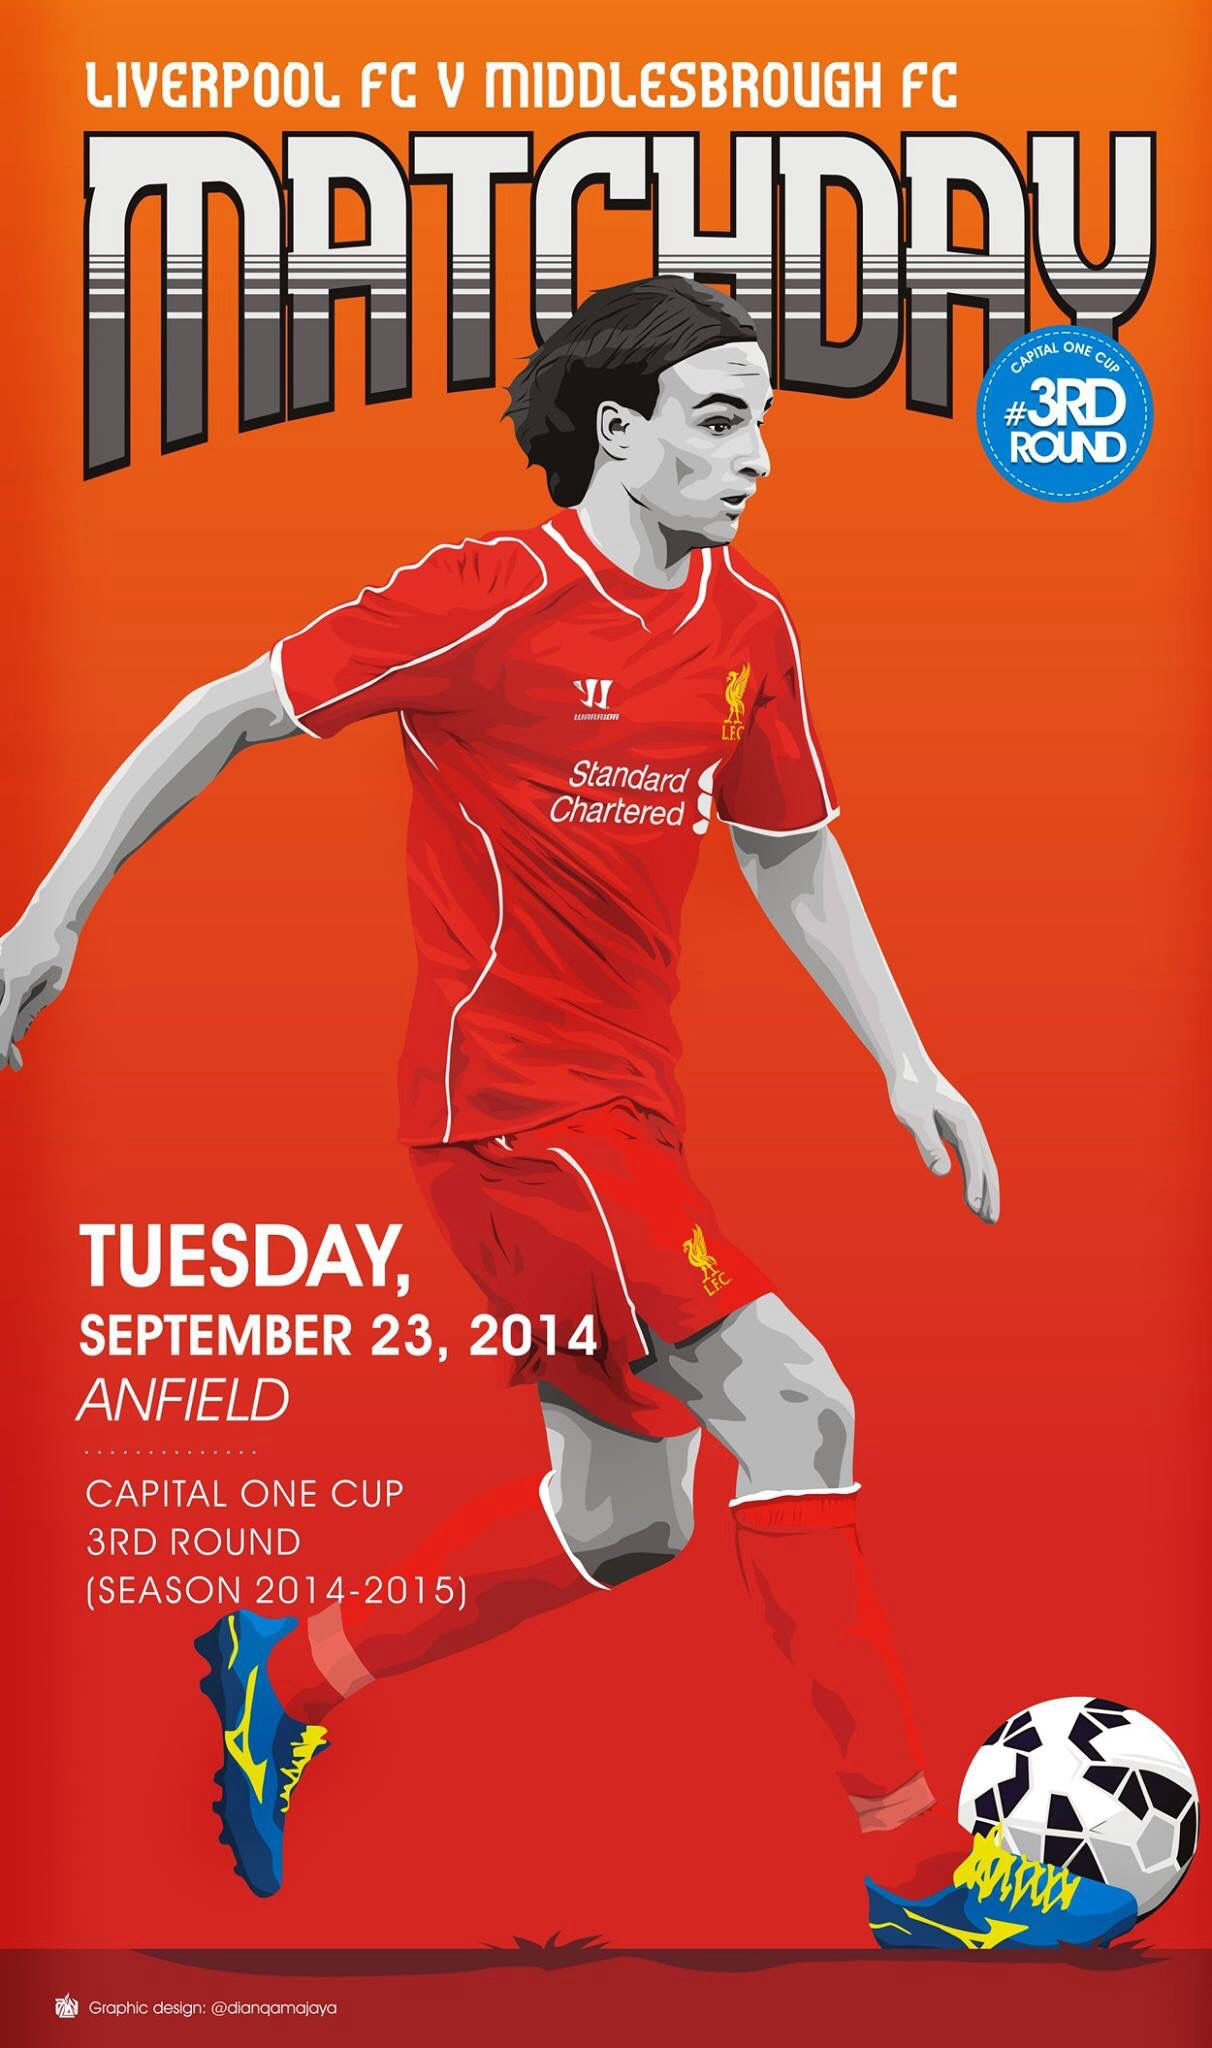 Cup night, September 23, 2014, LFC 1615 Middlesborough. A